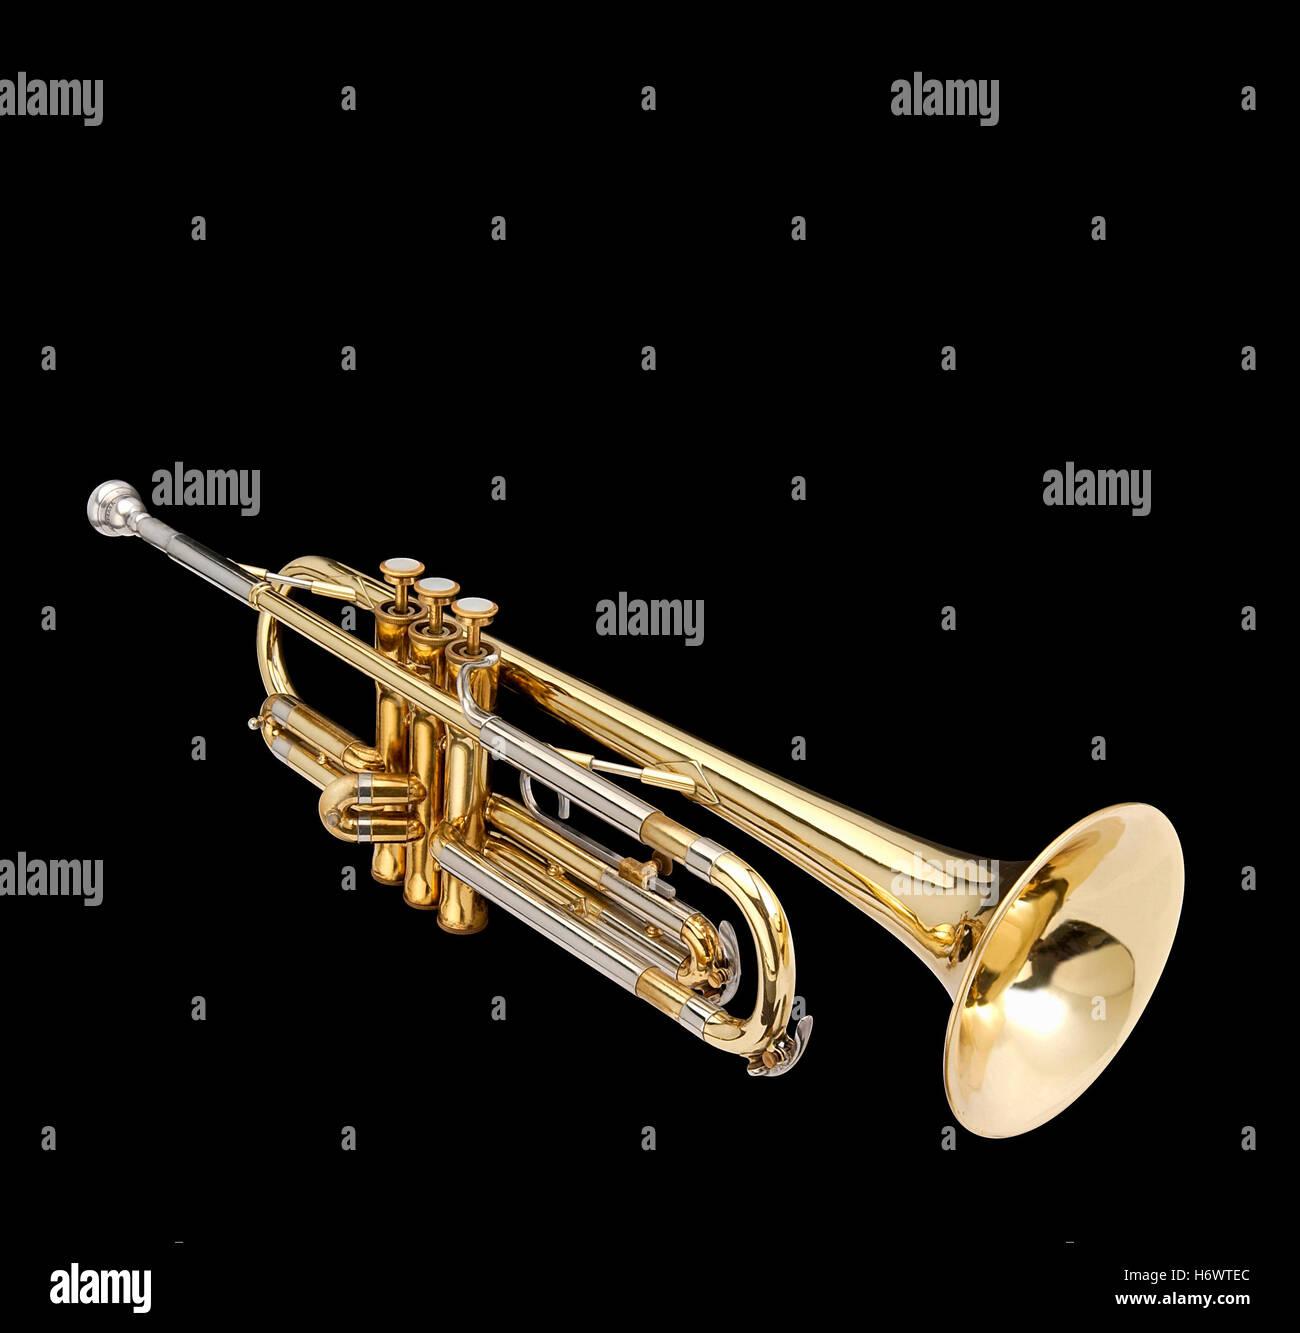 Solist Trumpet